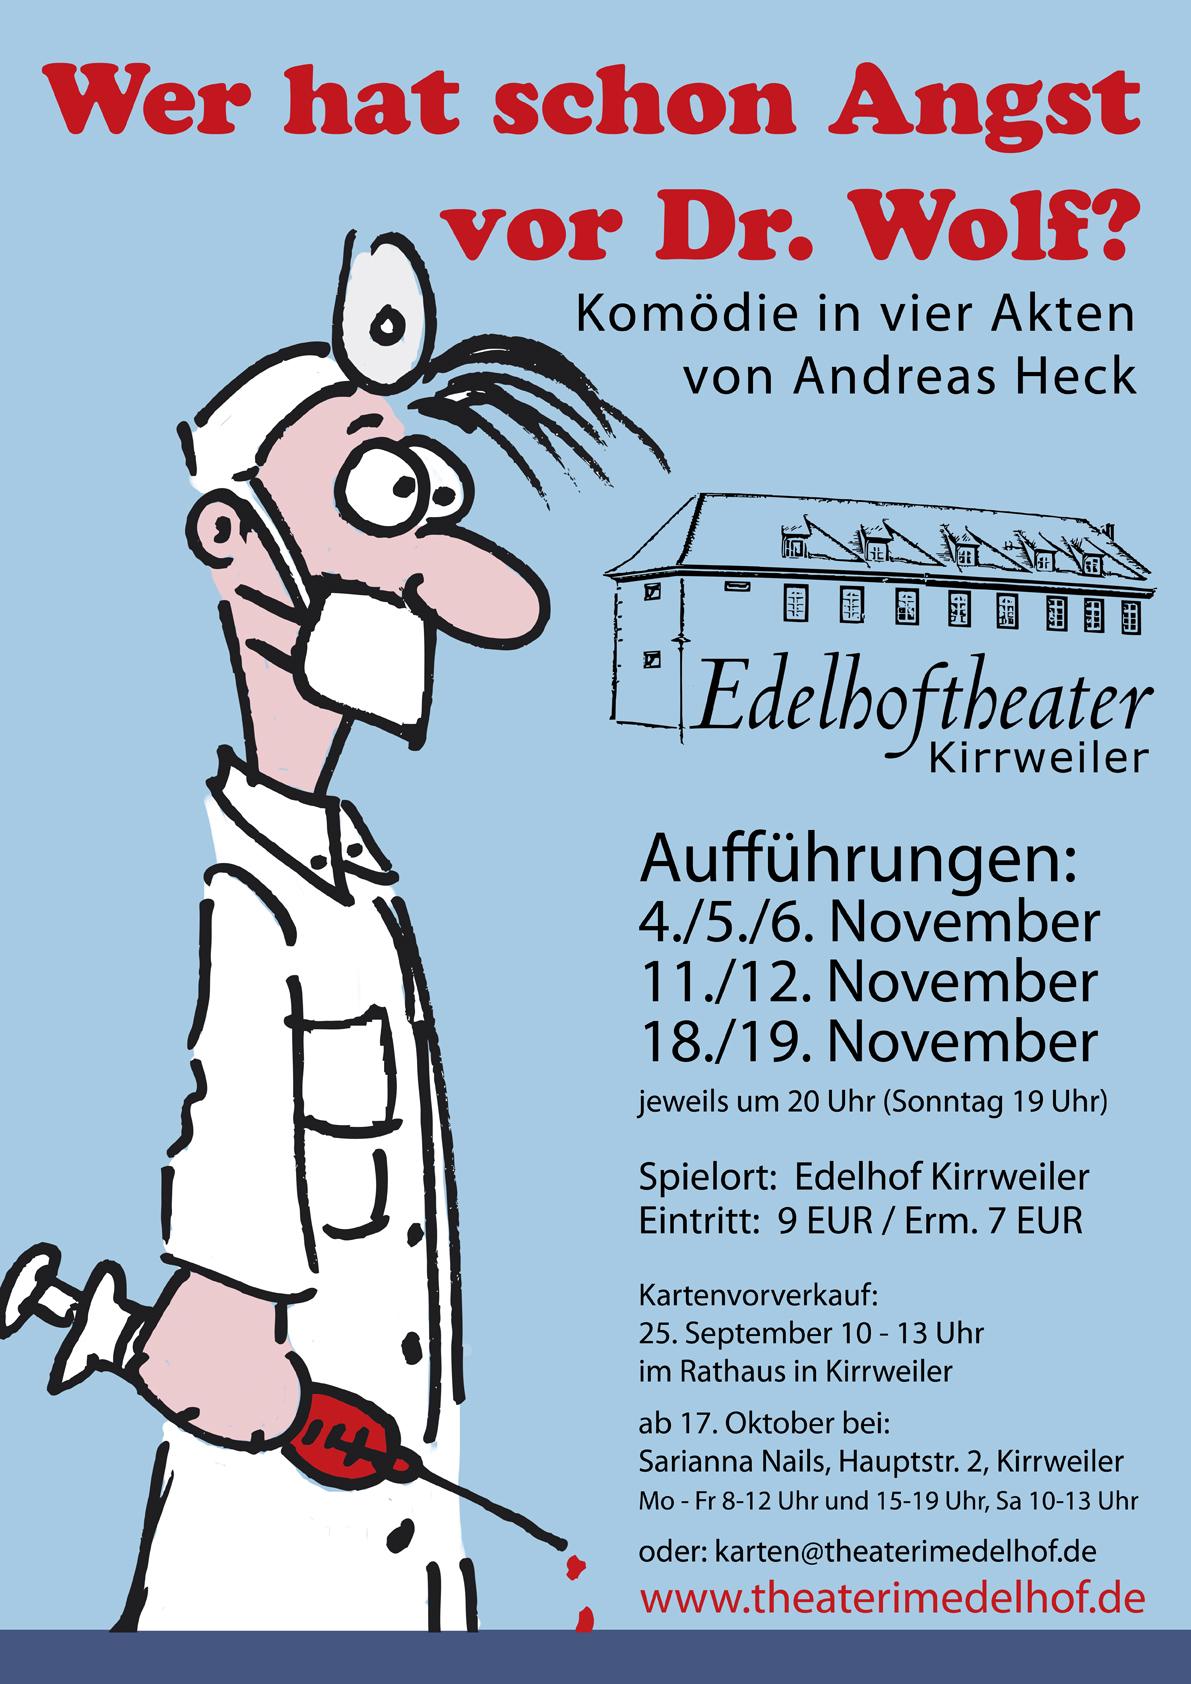 Plakat des Theaters im Edelhof in Kirrweiler